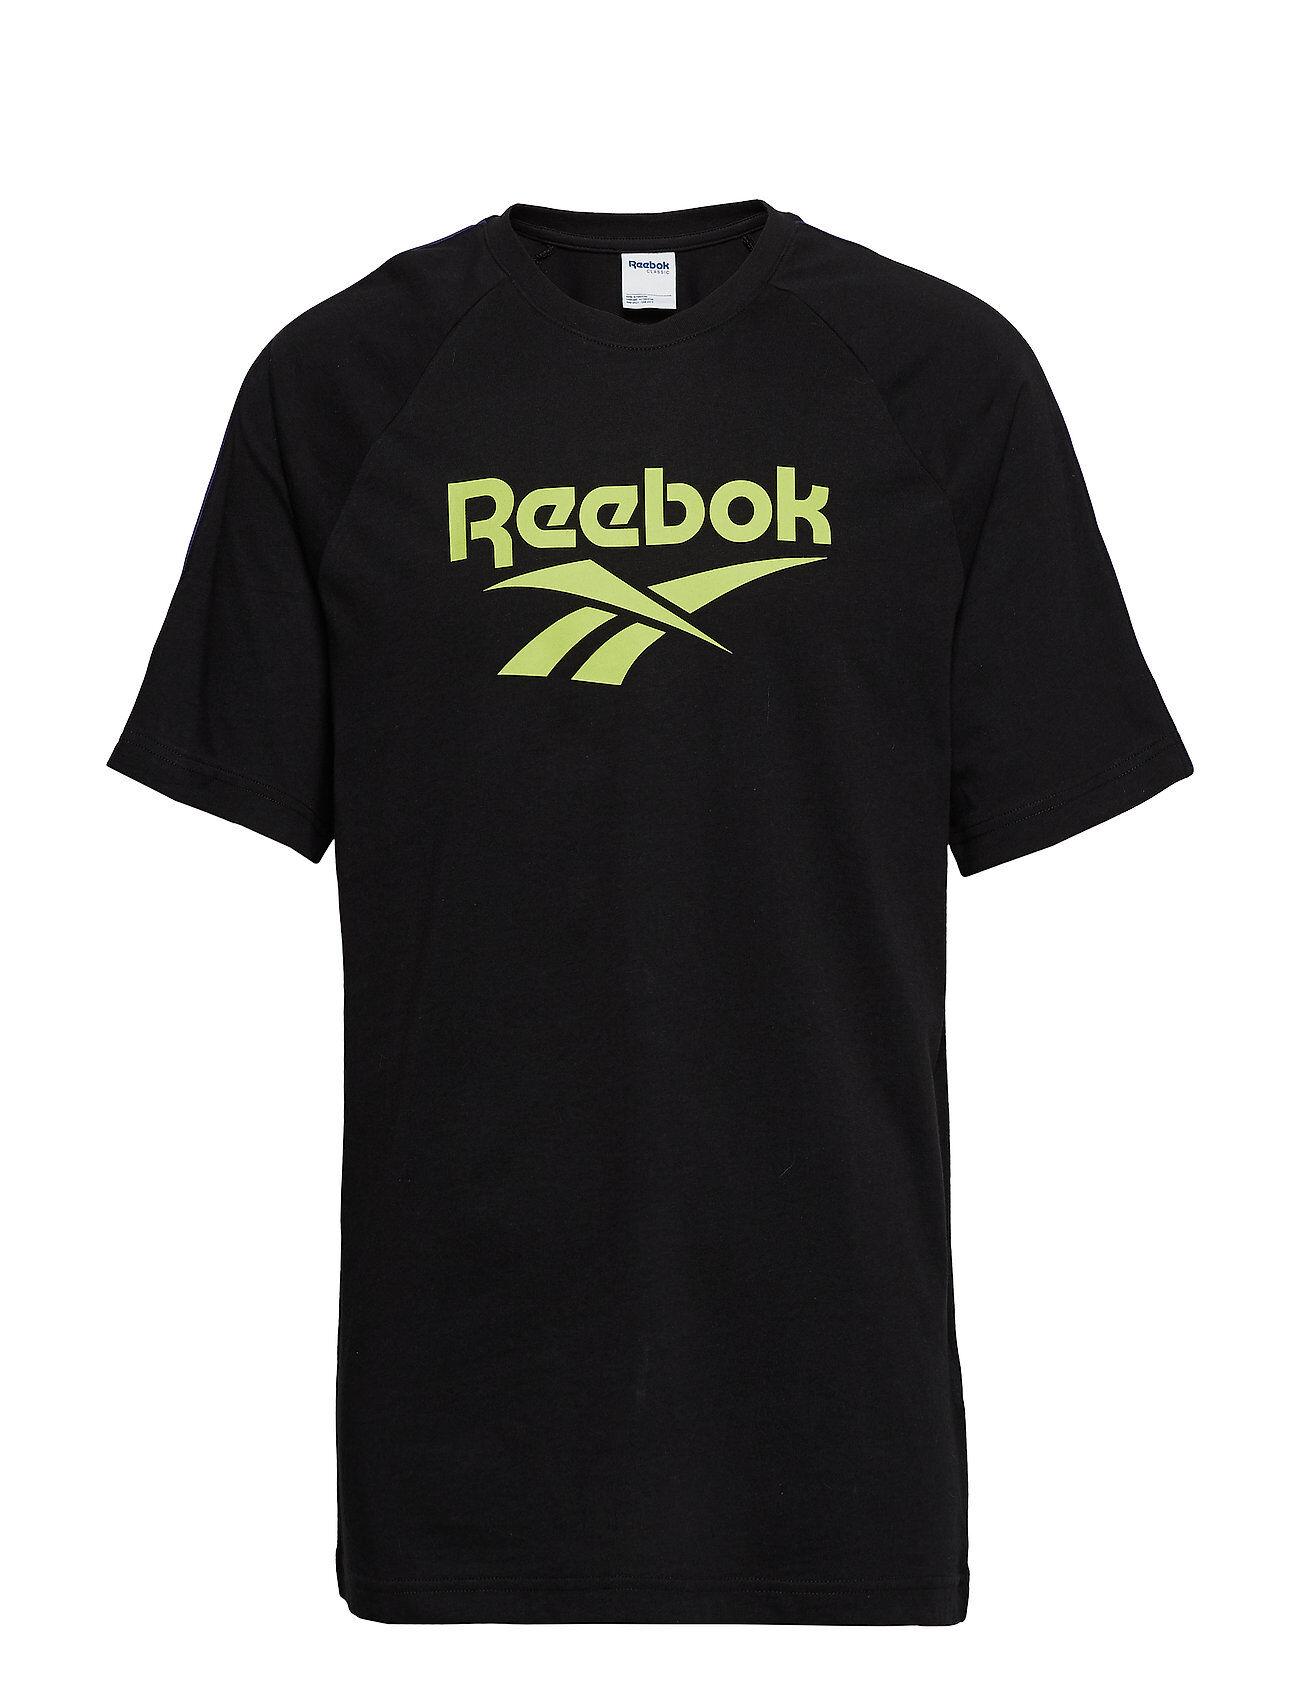 Reebok Classics Cl V P Tee Unisex T-shirts & Tops Short-sleeved Musta Reebok Classics